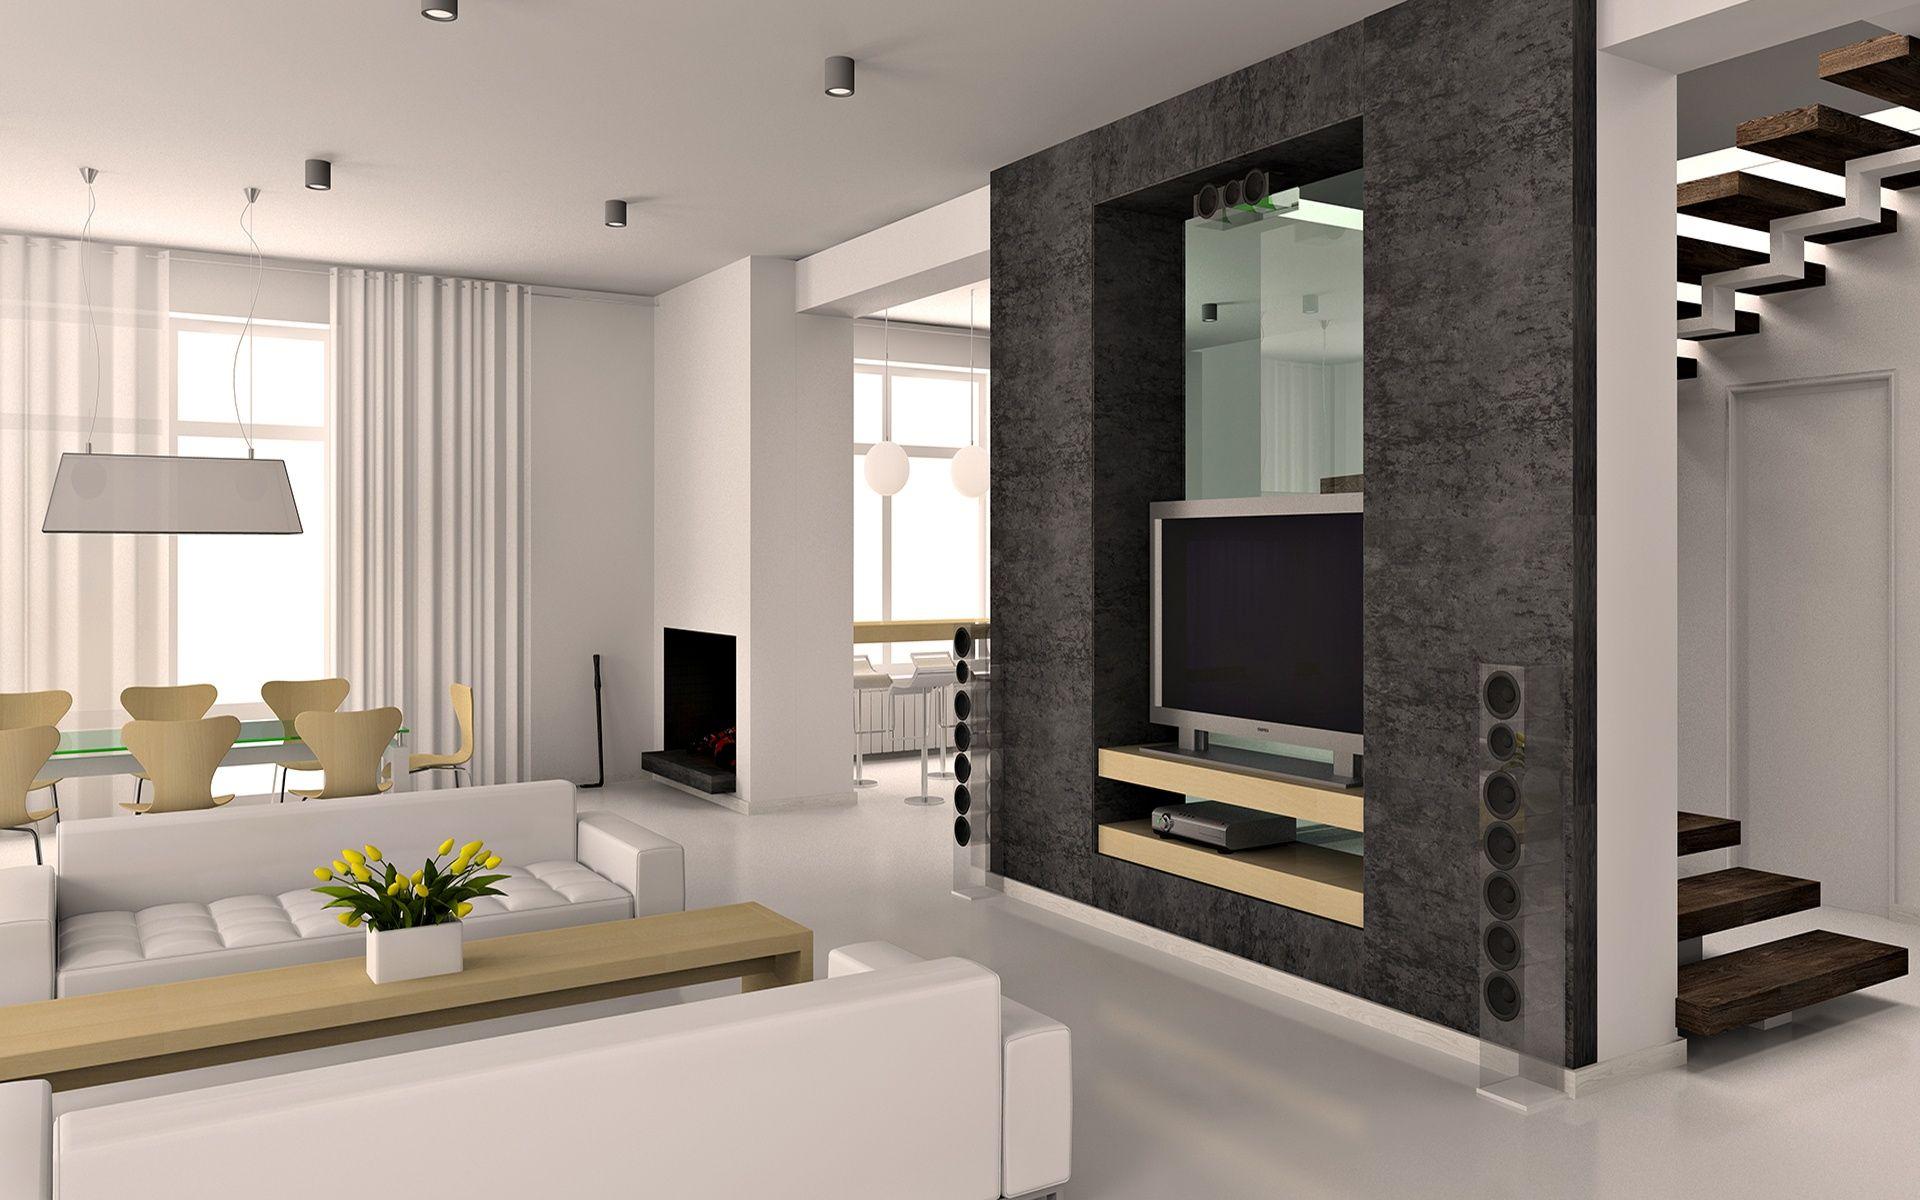 Design wallpaper and photo high resolution download interior design 1920x1200